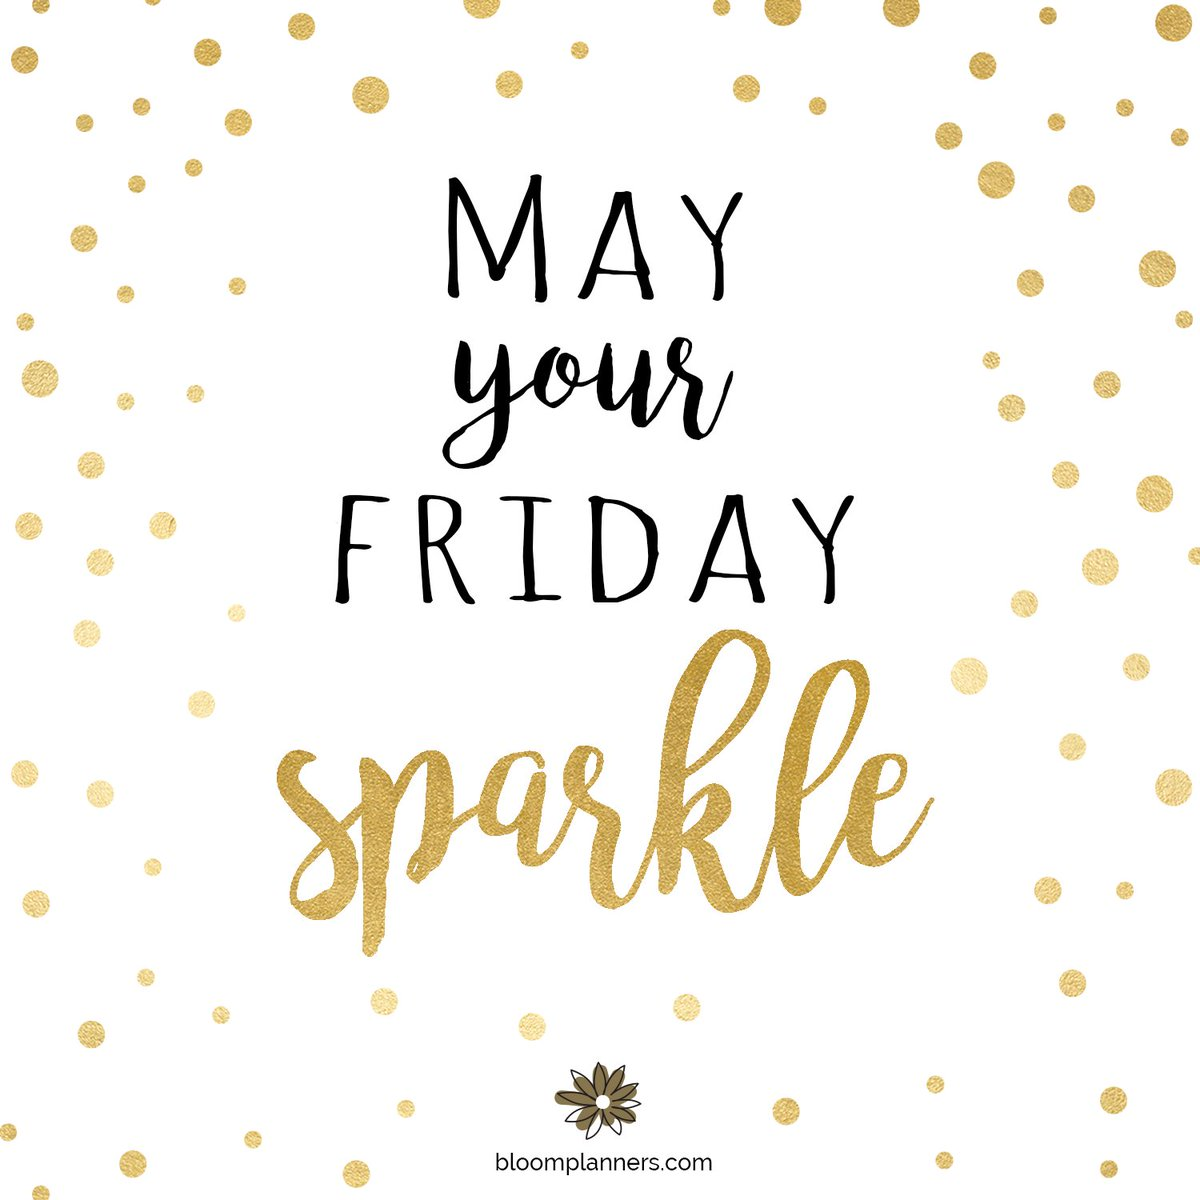 May your Friday sparkle! #FF #FridayFeeling #FridayThoughts @Hazloe3 @avdude @KariJoys @GiGiBclub @JobiTheLab @thephoneladyca @JackConnie @NancyRichmond @BestEverYou @McCarrenBill @chuckallen22 @troolsocial @DIYMarketers @Reflective_Soul @BestEverYou @b_and_s_designs<br>http://pic.twitter.com/bCCXuL4OYF